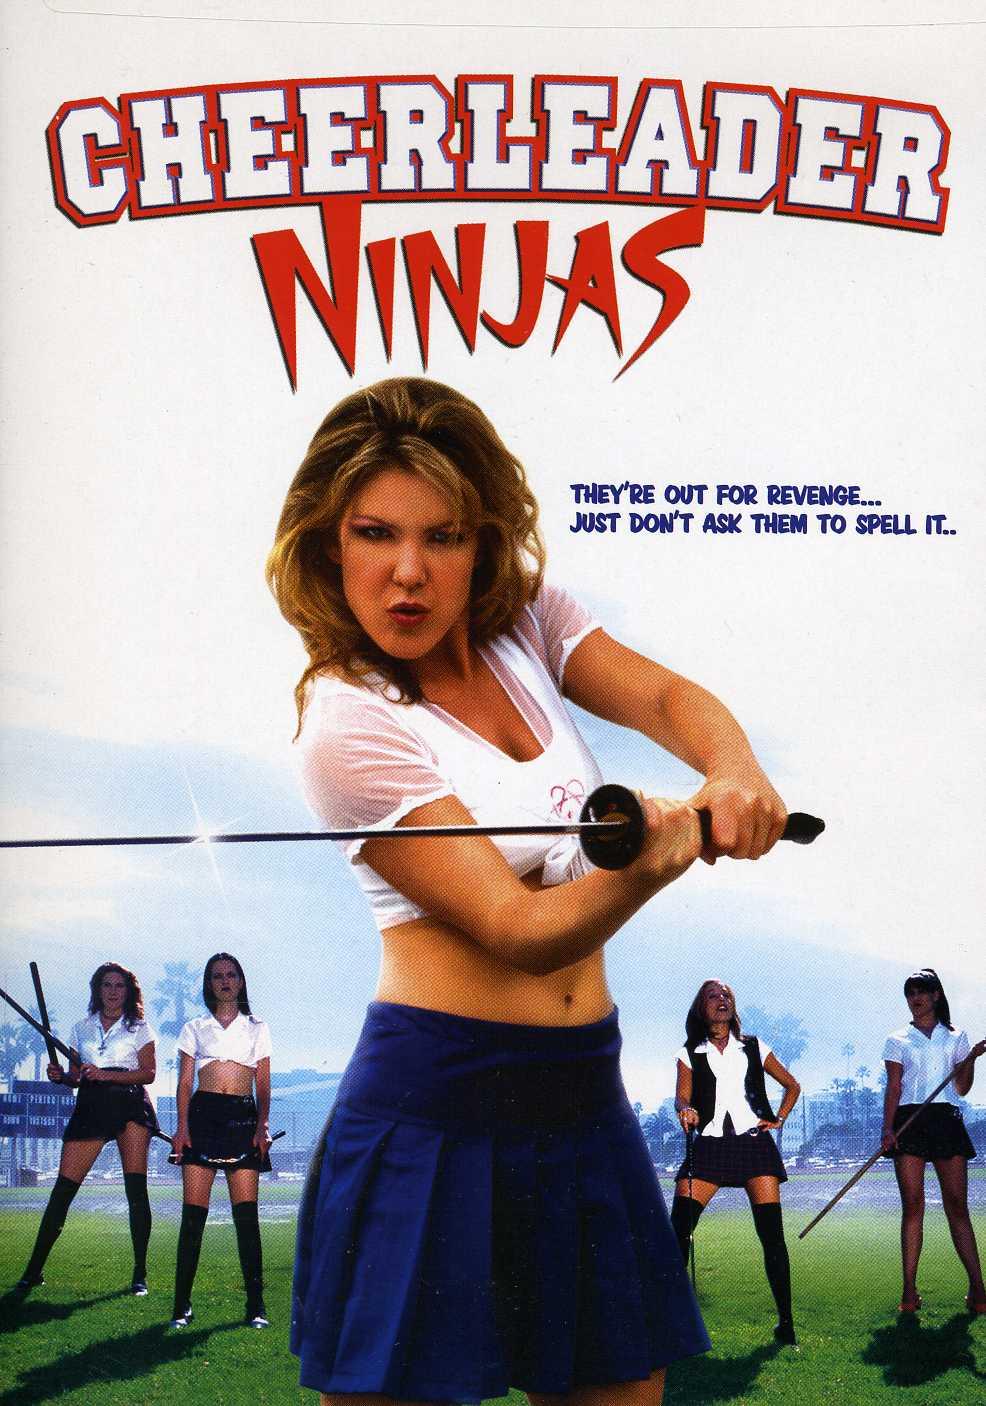 Cheerleader Ninjas (DVD)